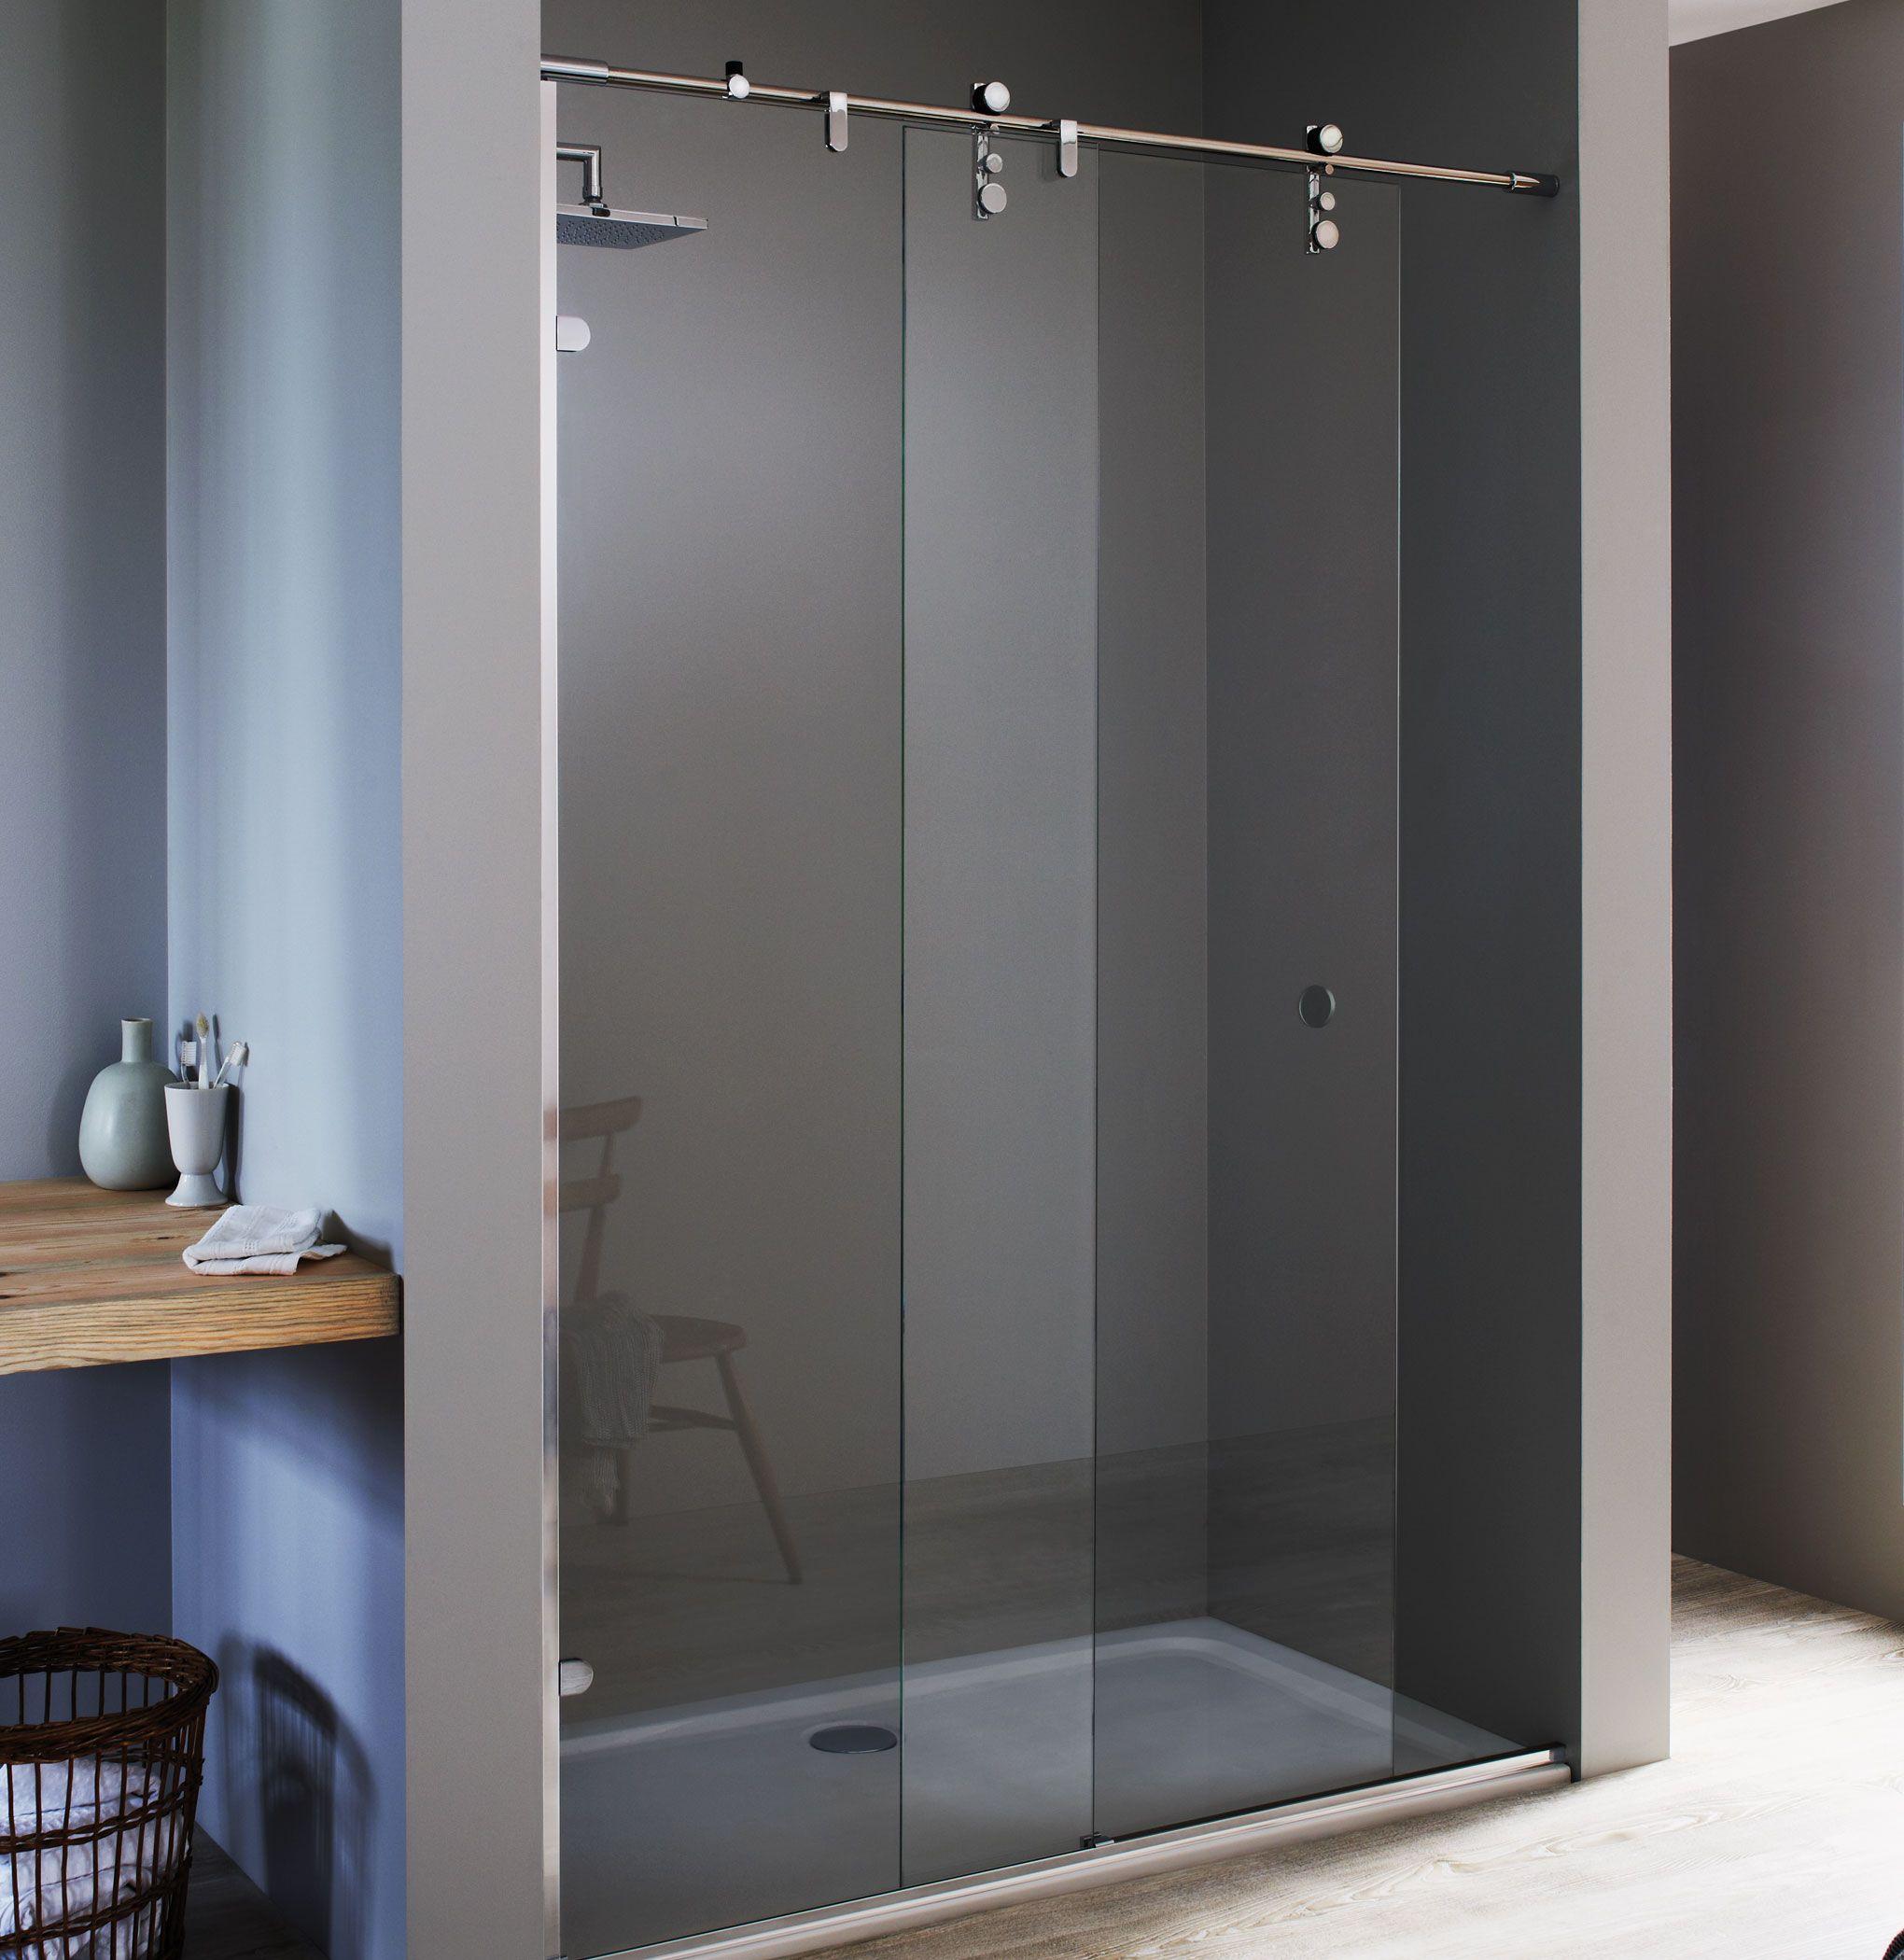 Majestic Vigo Sliding Shower Door Option 2   Jane Snook   Pinterest ...